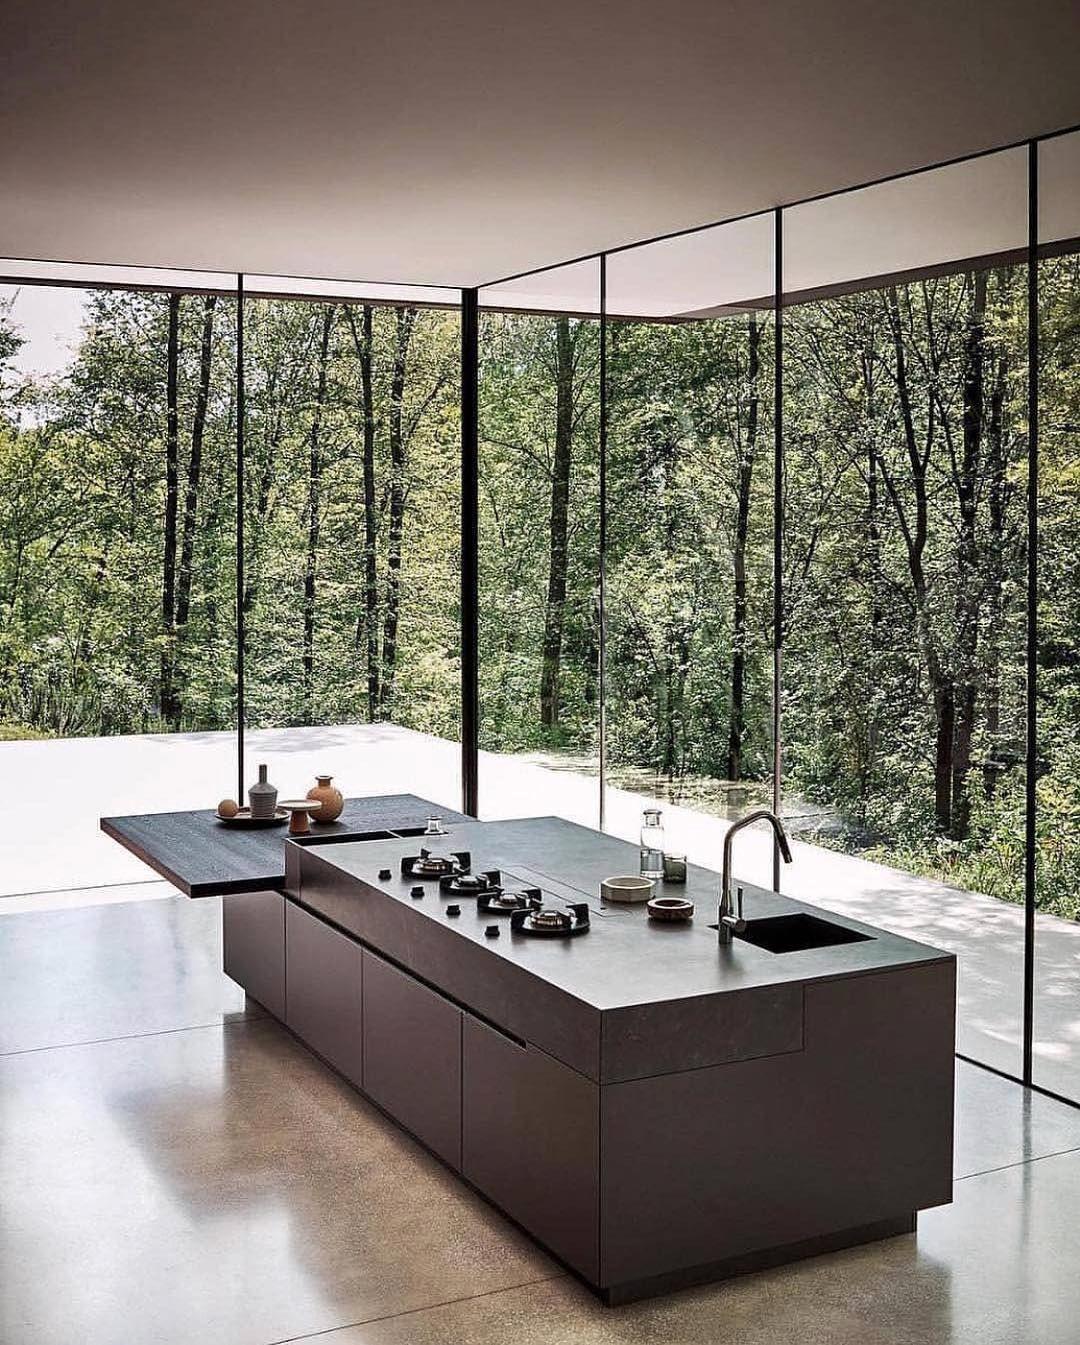 Stunning Kitchen Interior Follow Us Black Kitchen Island Luxury Kitchens House Design